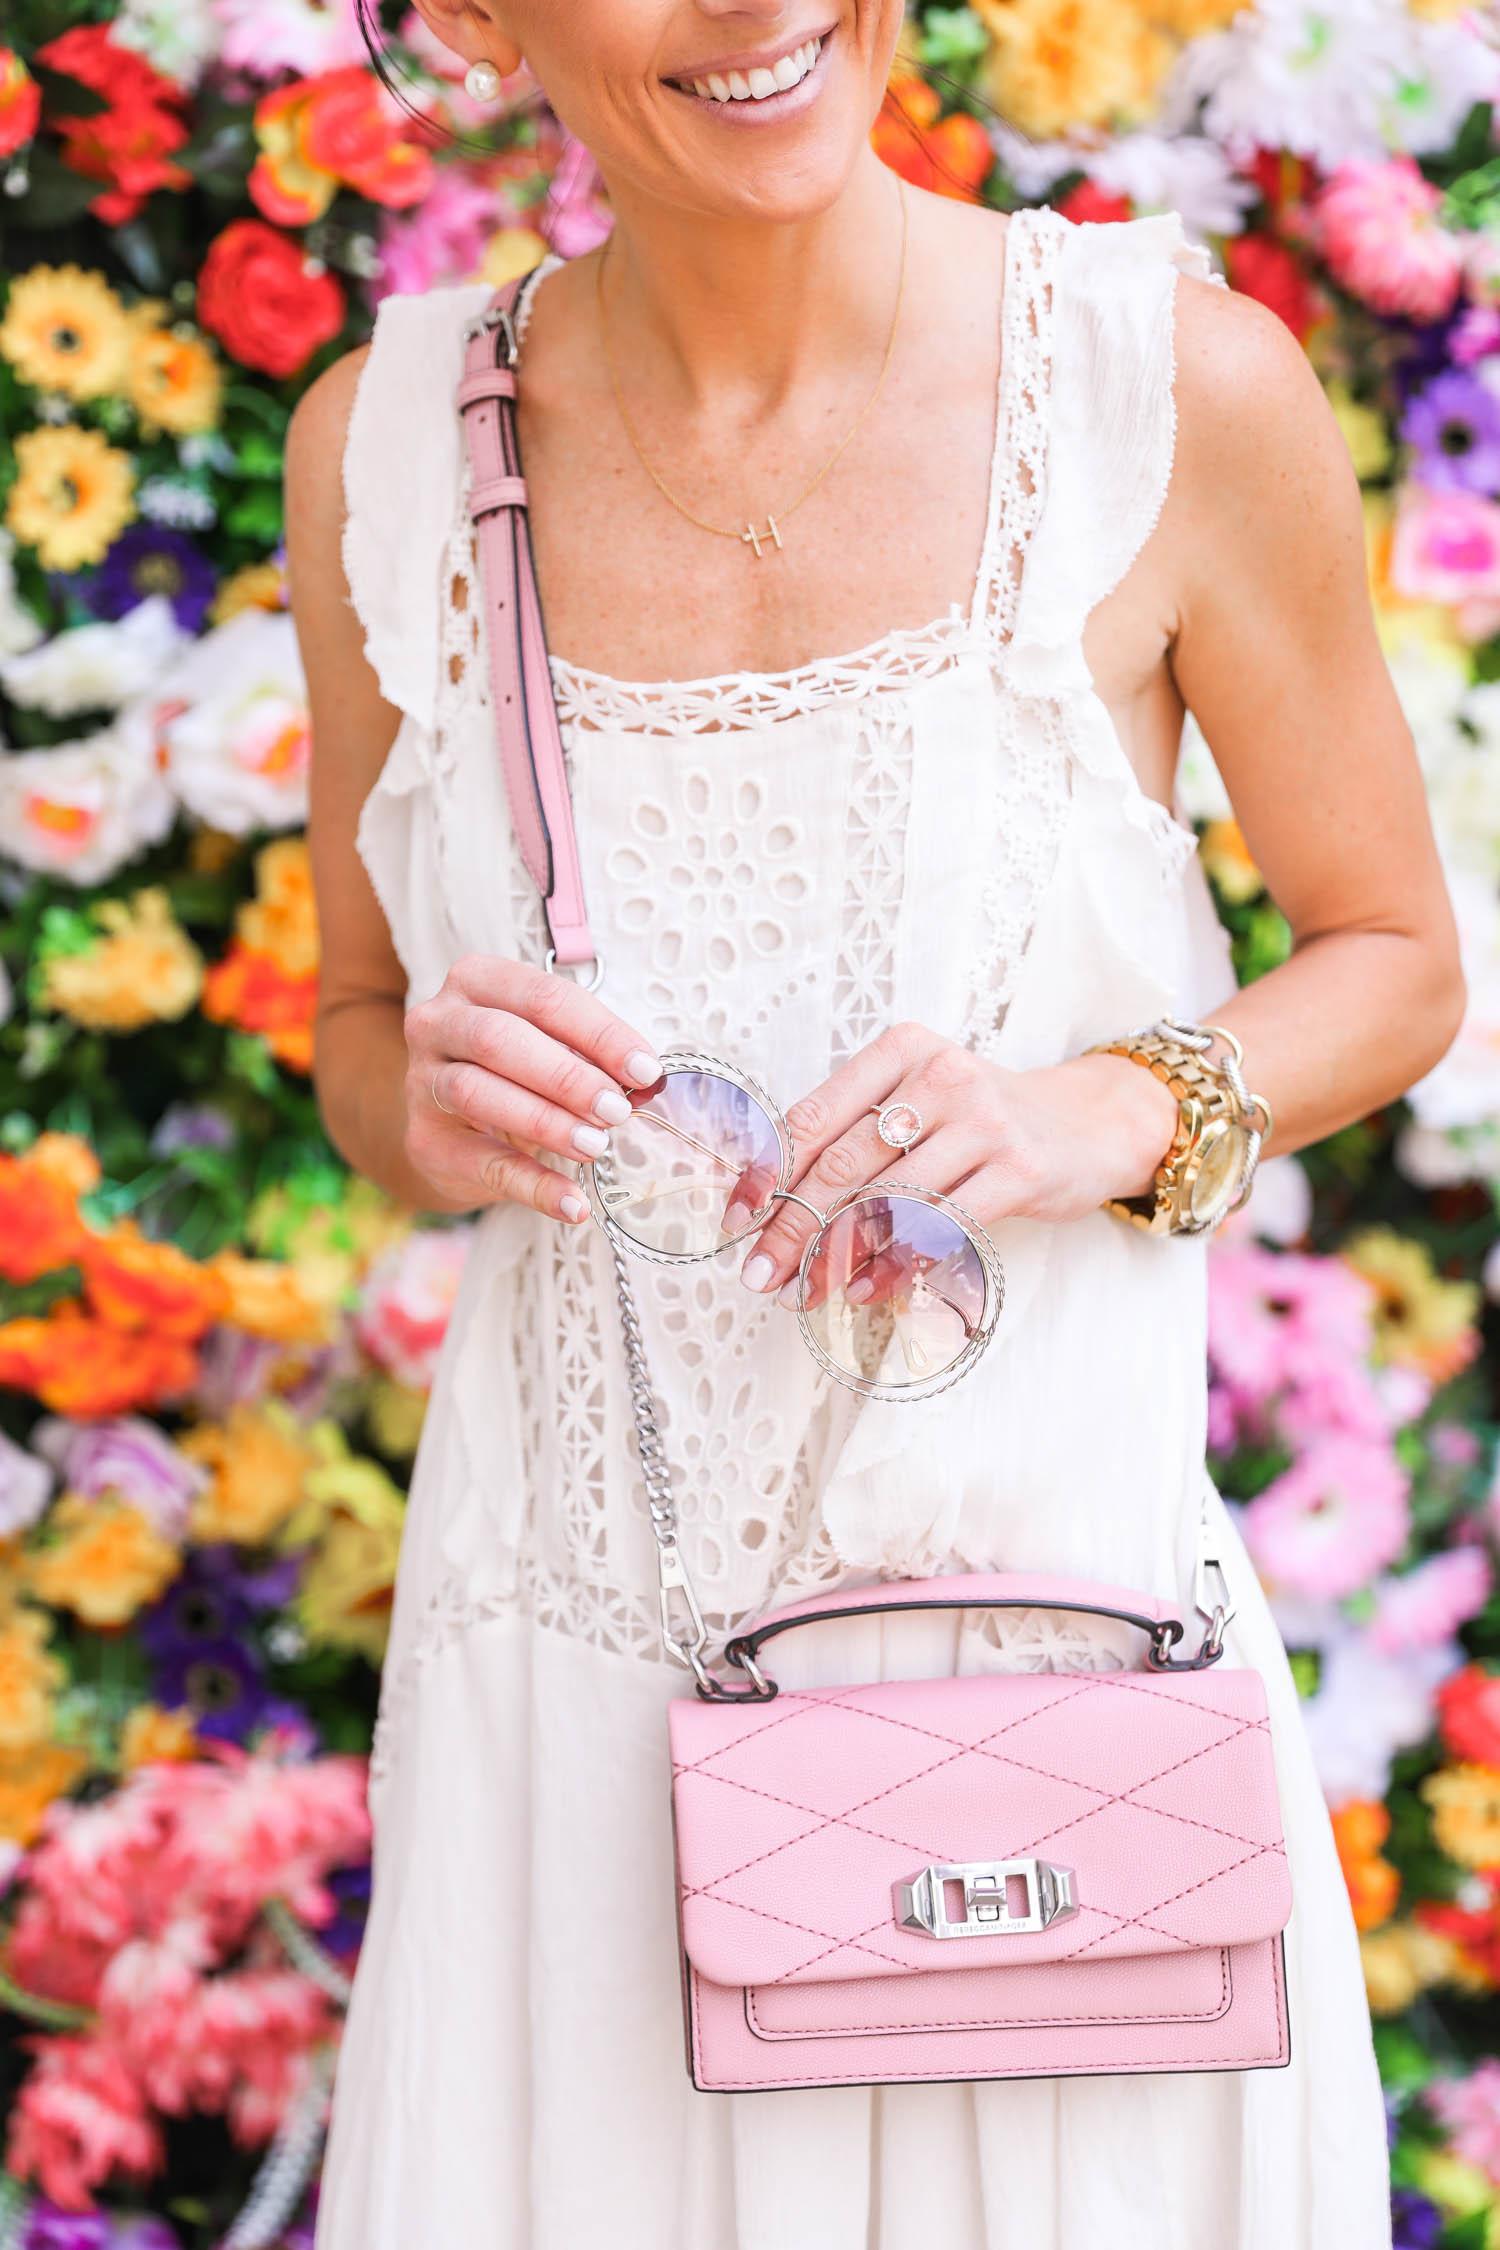 chloe round sunglasses, mytheresa.com, flower wall, lisbon, portugal, free people priscilla dress, rebecca minkoff pink cross body hangbag,